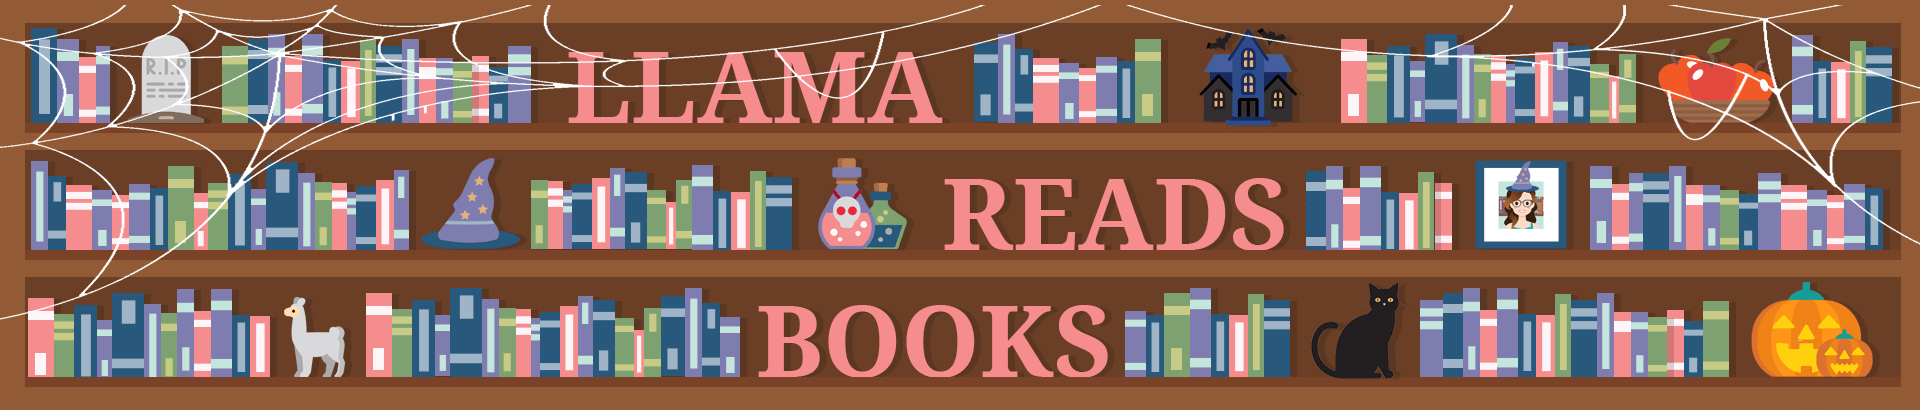 Llama Reads Books